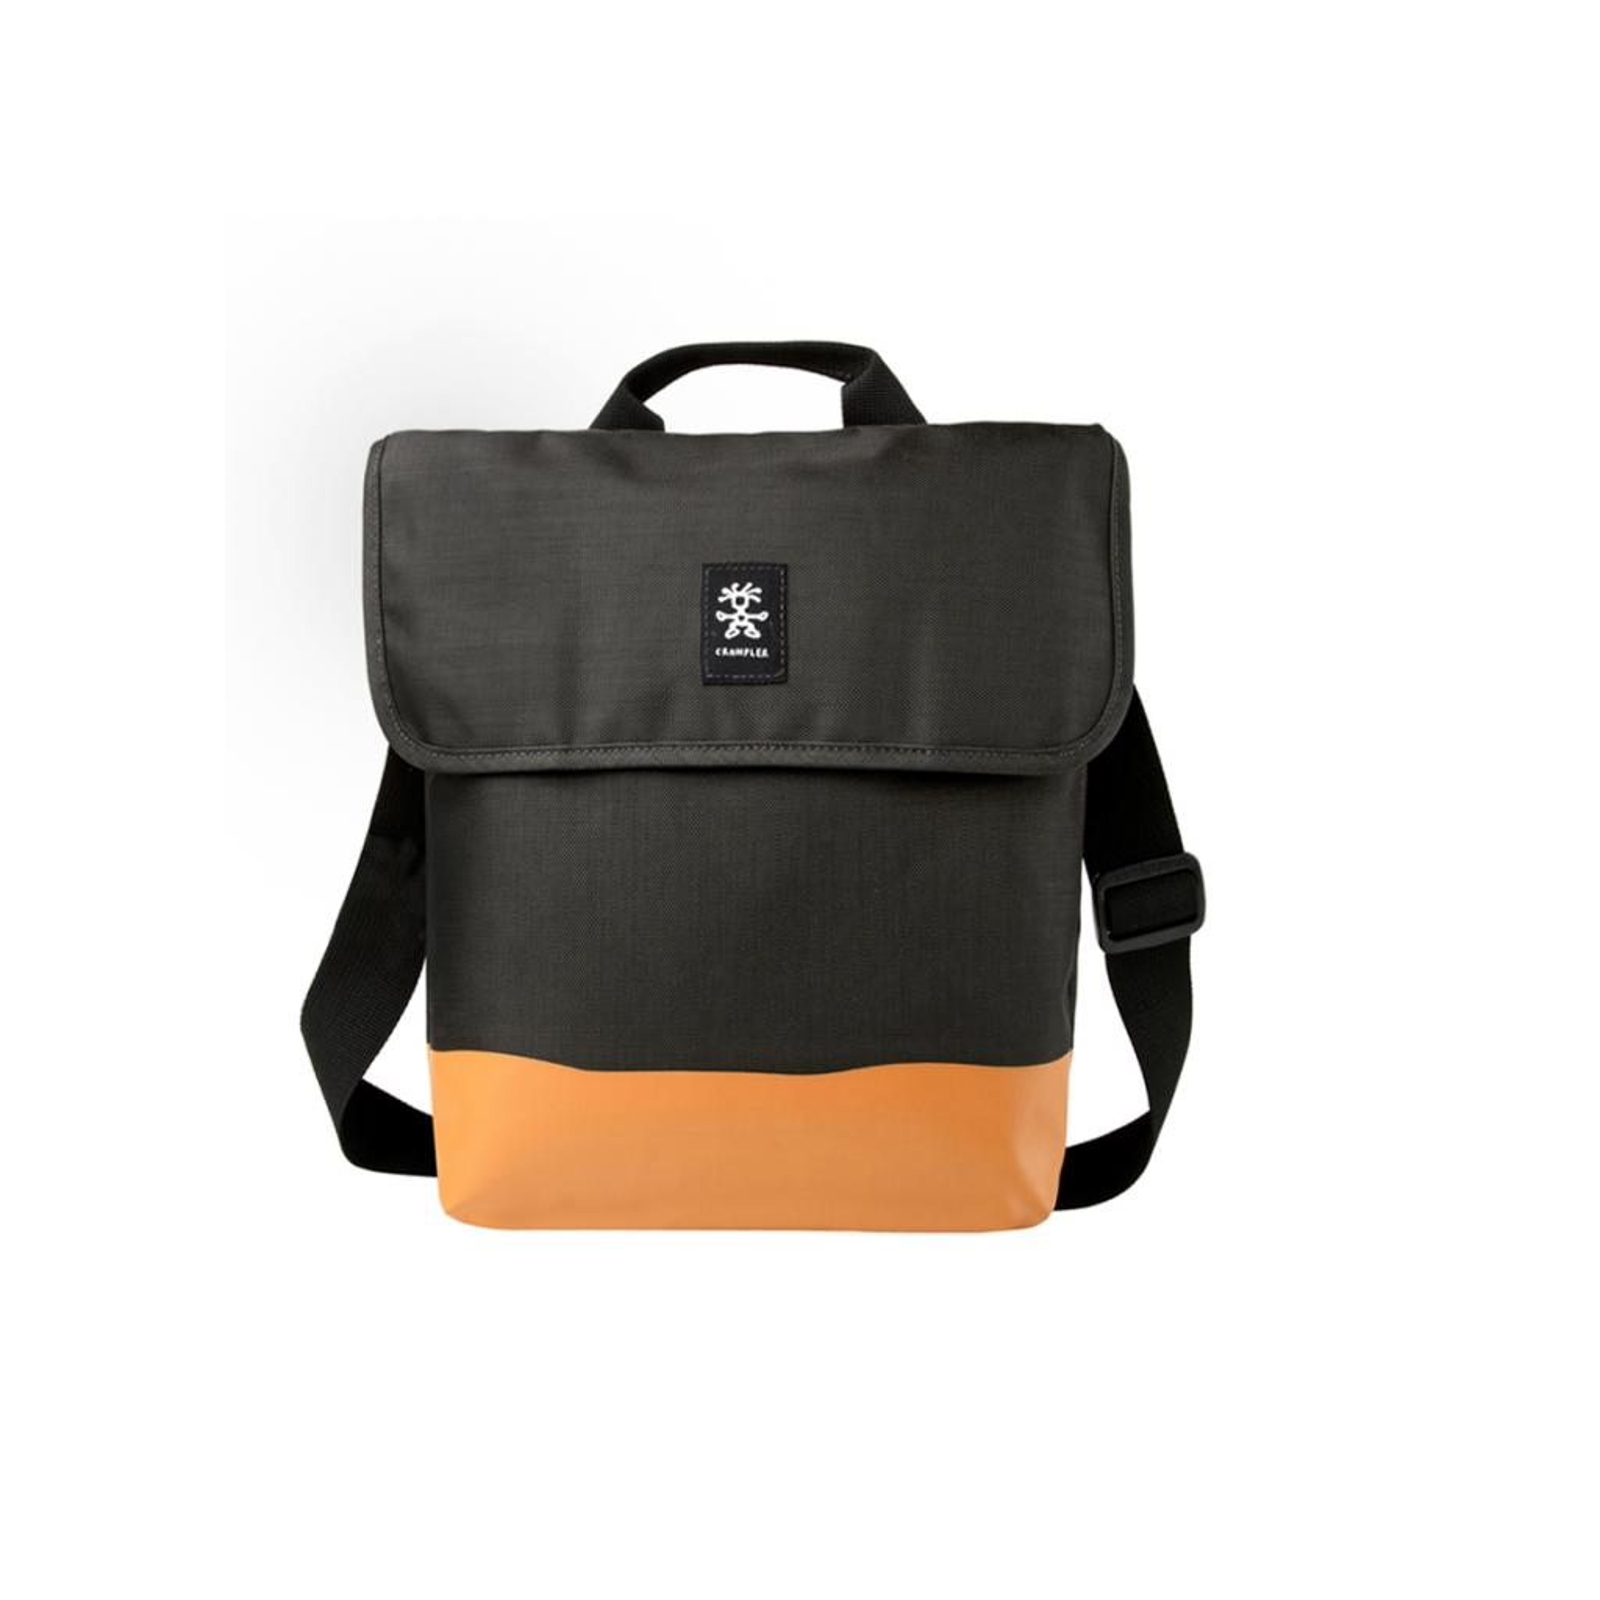 Чехол для планшета Crumpler 9 Private Surprise Sling Tablet/charcoal - orange (PSST-004)